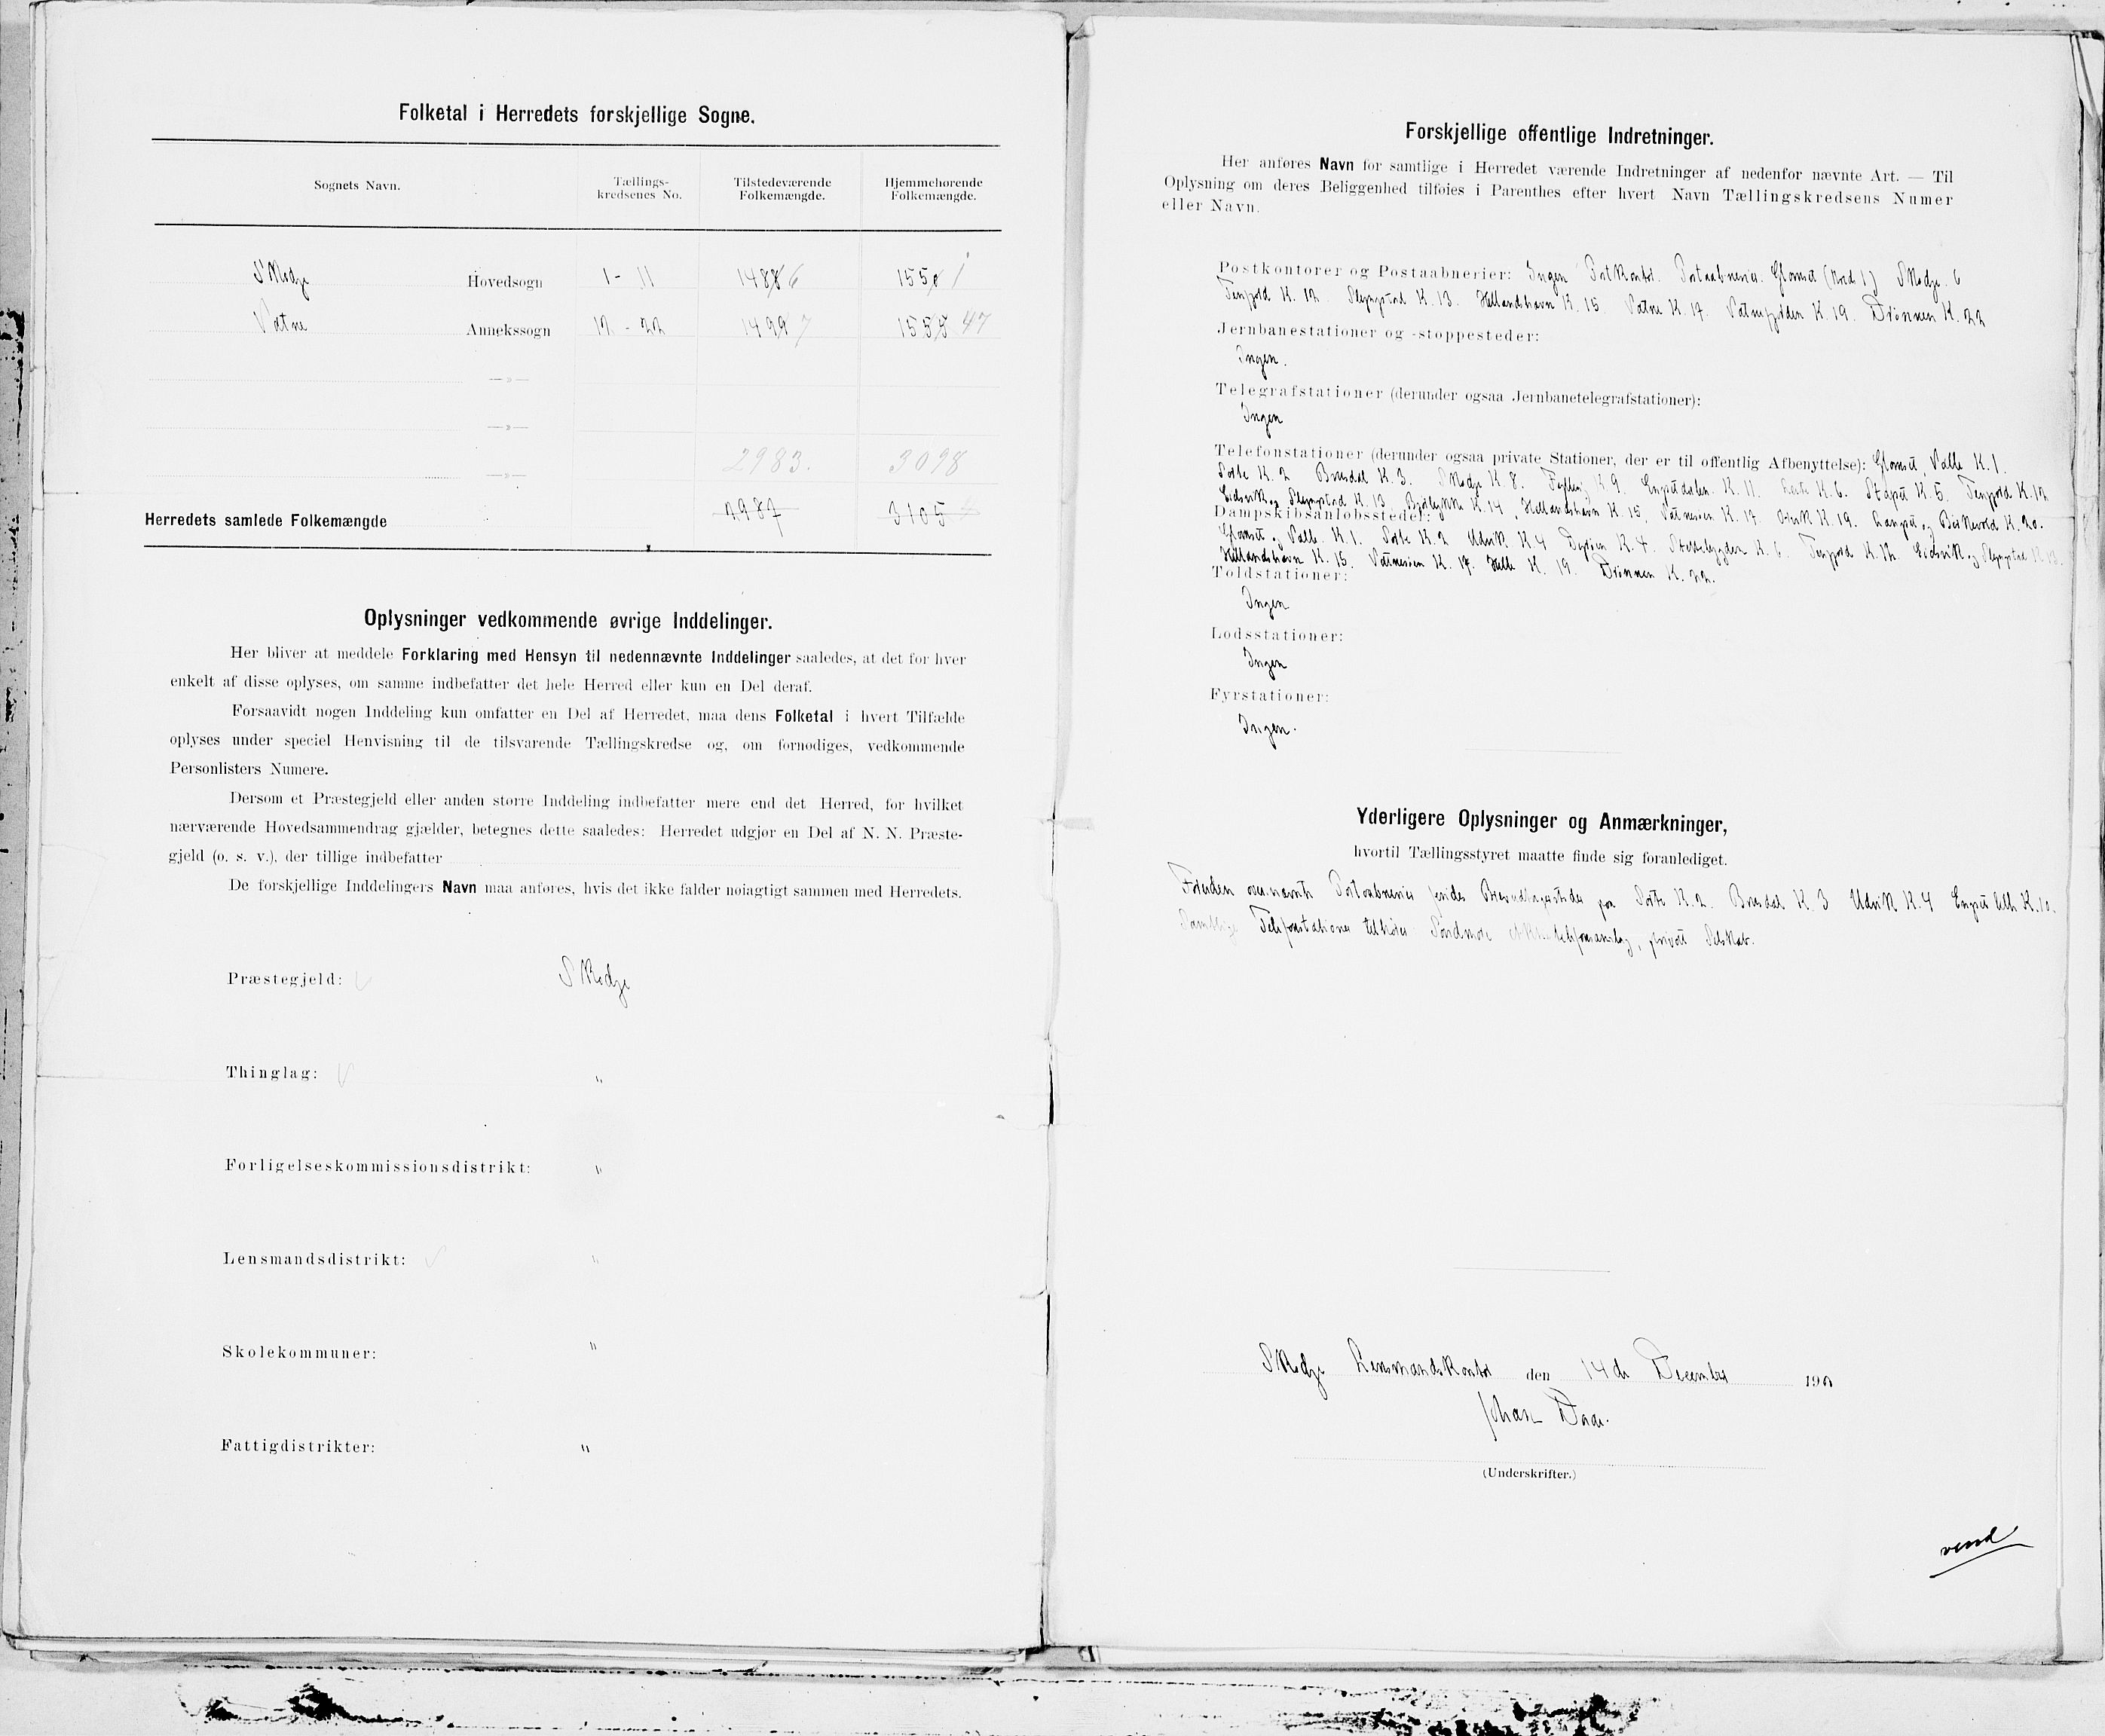 SAT, 1900 census for Skodje, 1900, p. 47